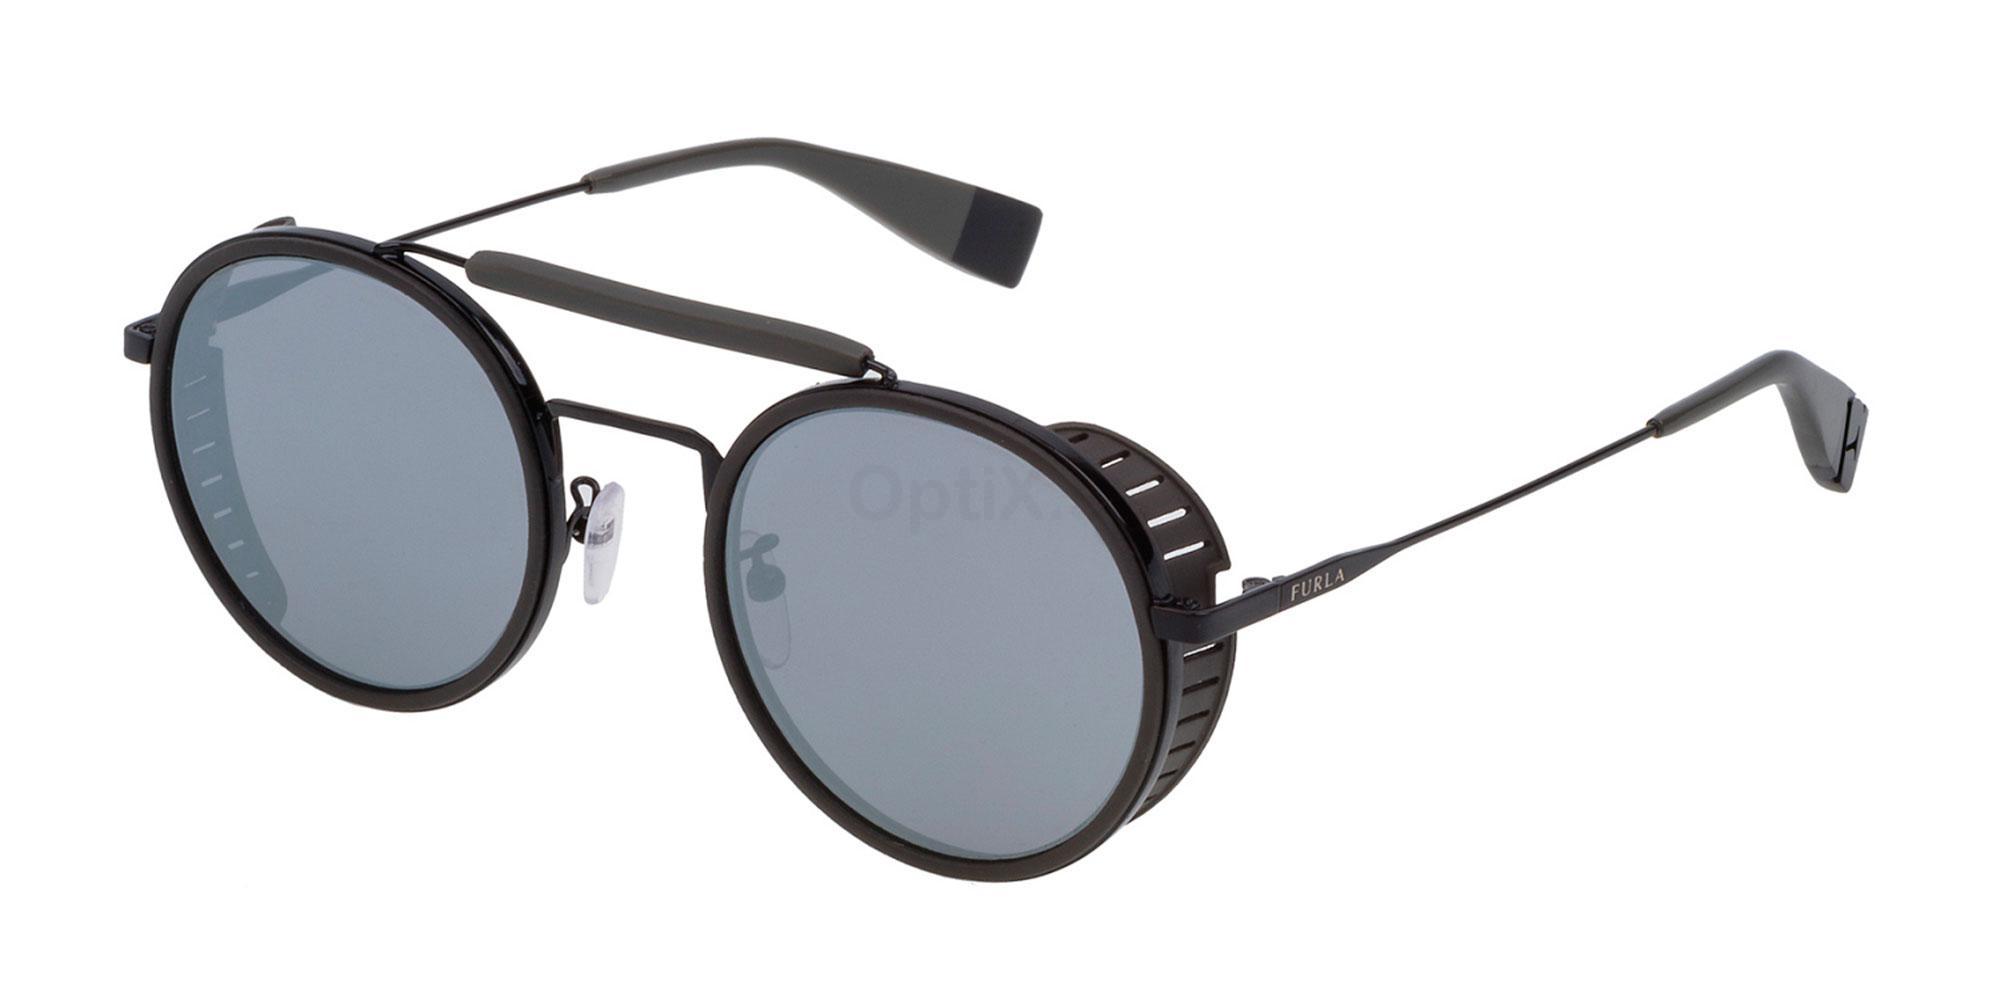 530X SFU216 Sunglasses, Furla